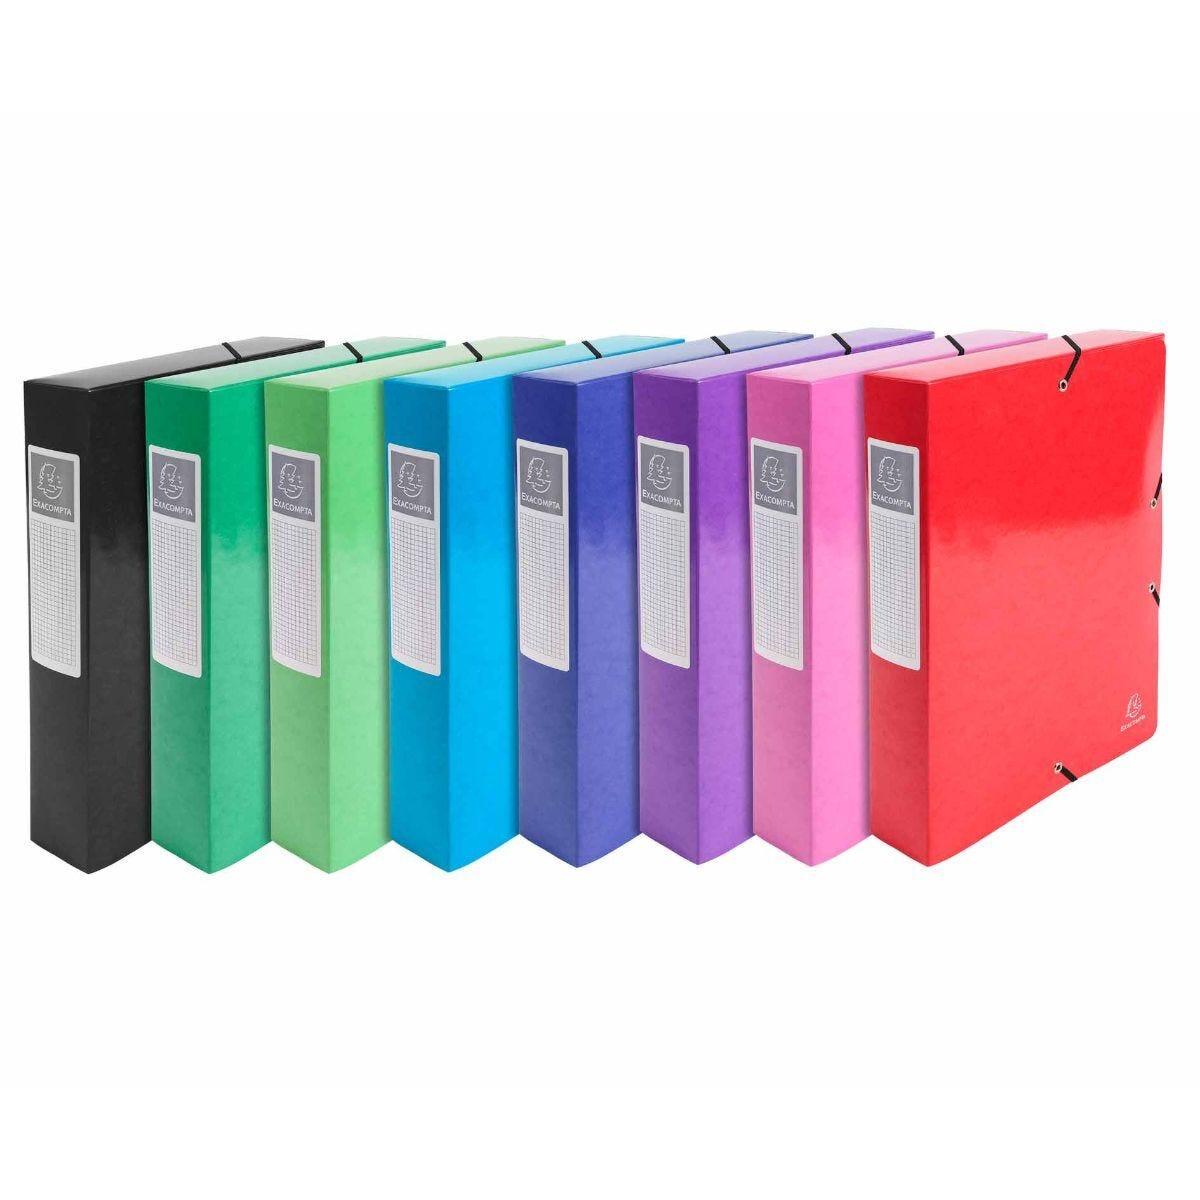 Exacompta Iderama Elasticated A4 Box File 60mm Pack of 8 Assorted